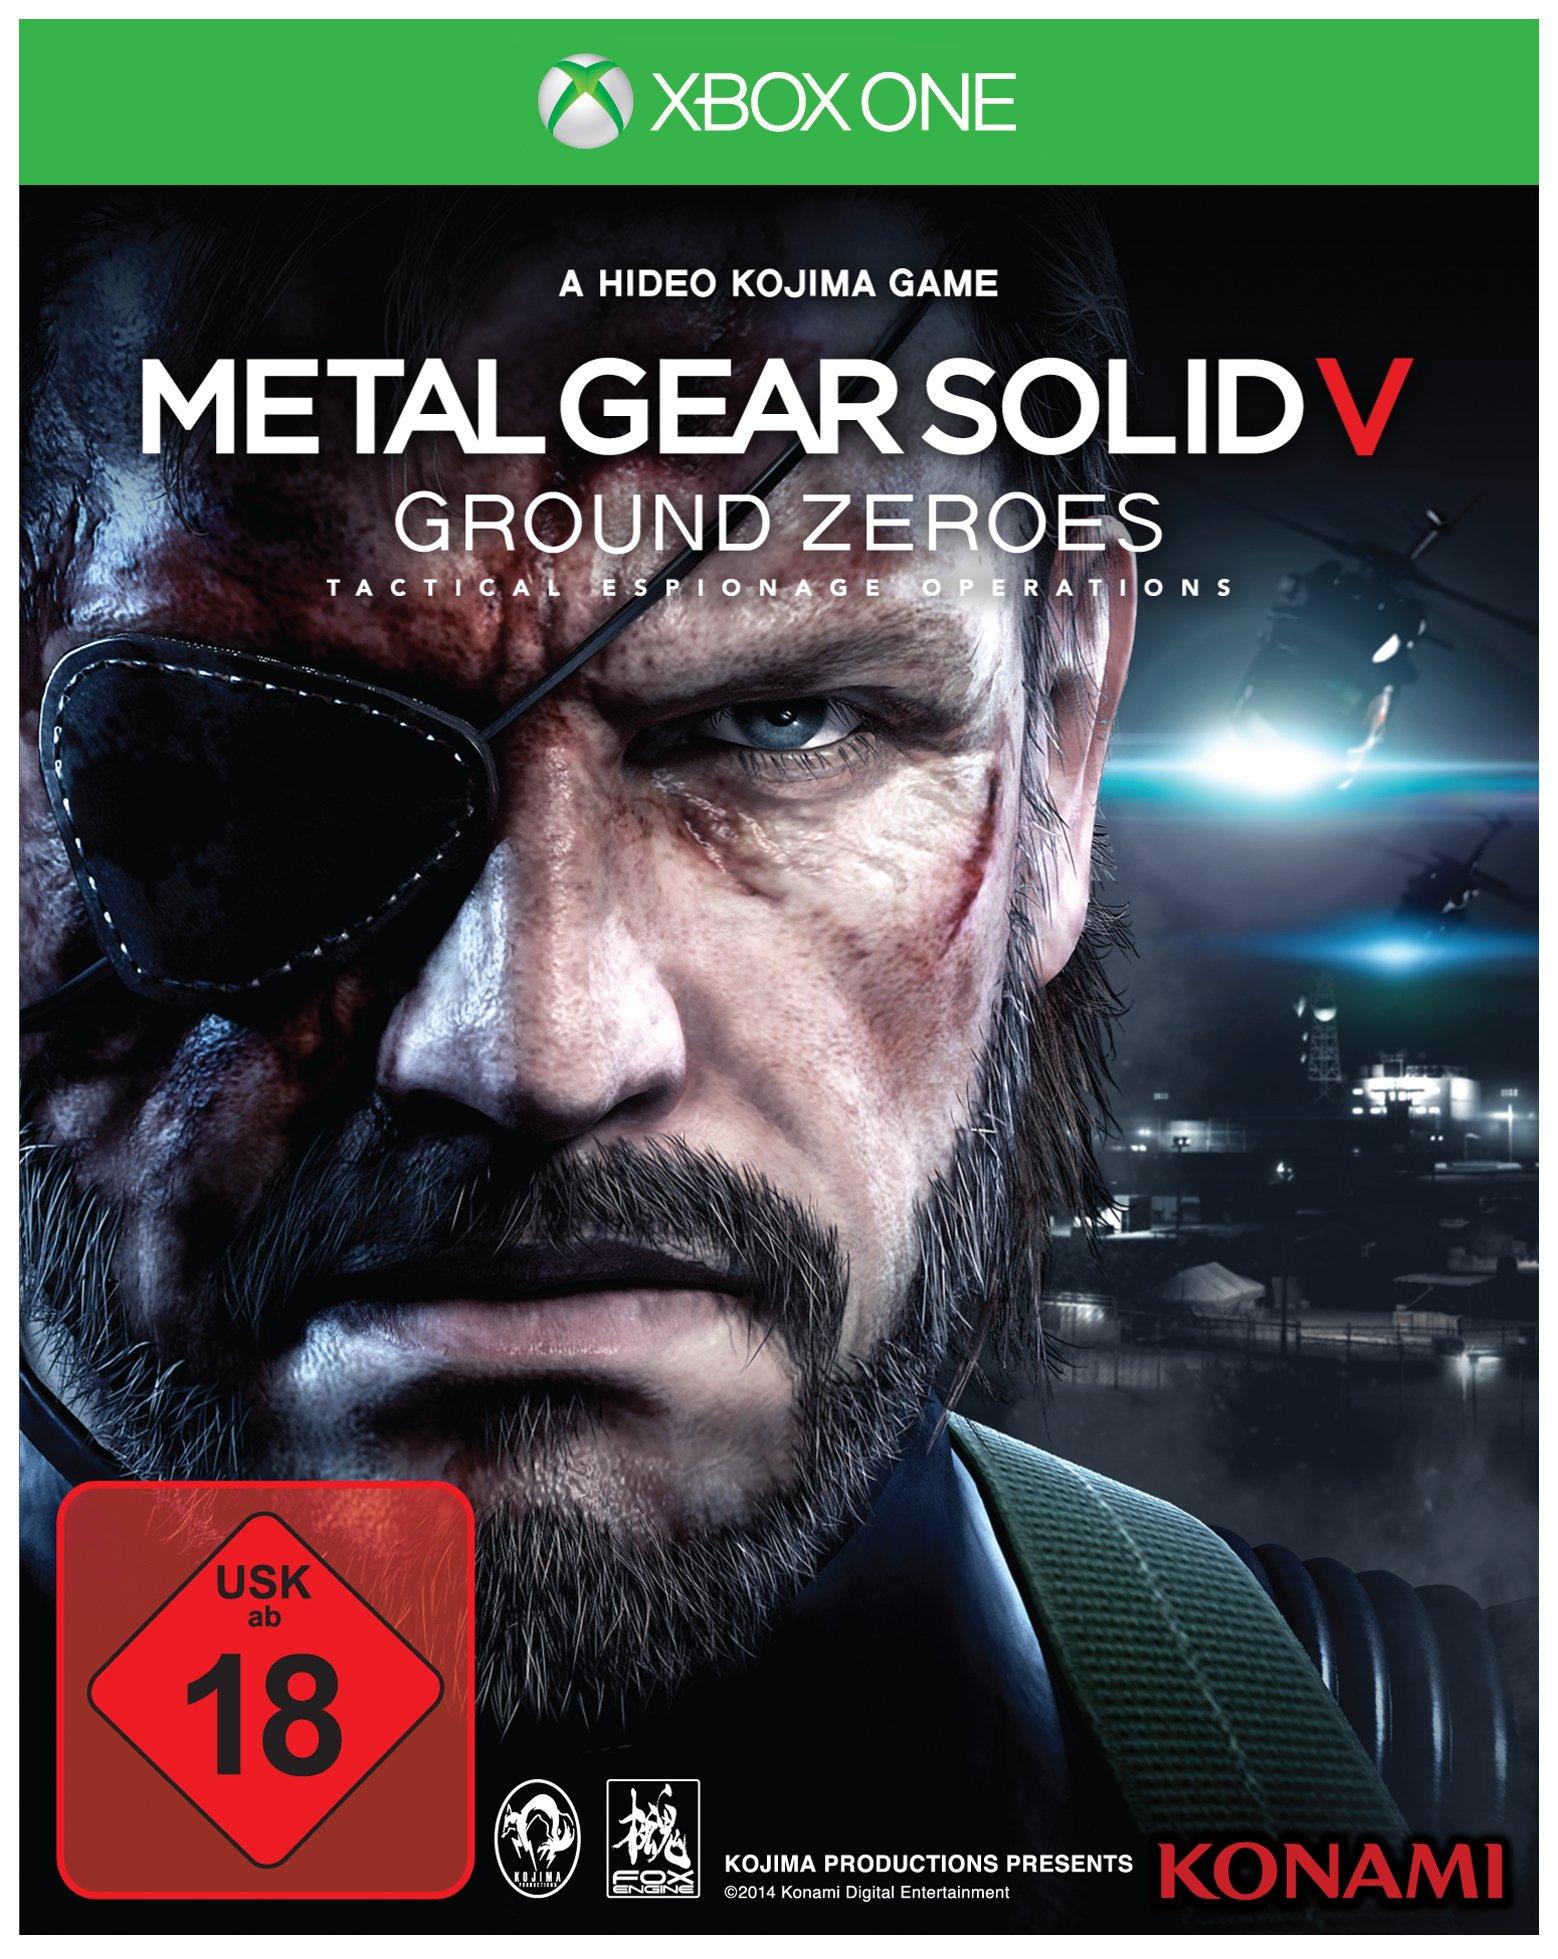 [Xbox One] Metal Gear Solid V: Ground Zeroes | Lokal Expert (Neuss/Dormagen)